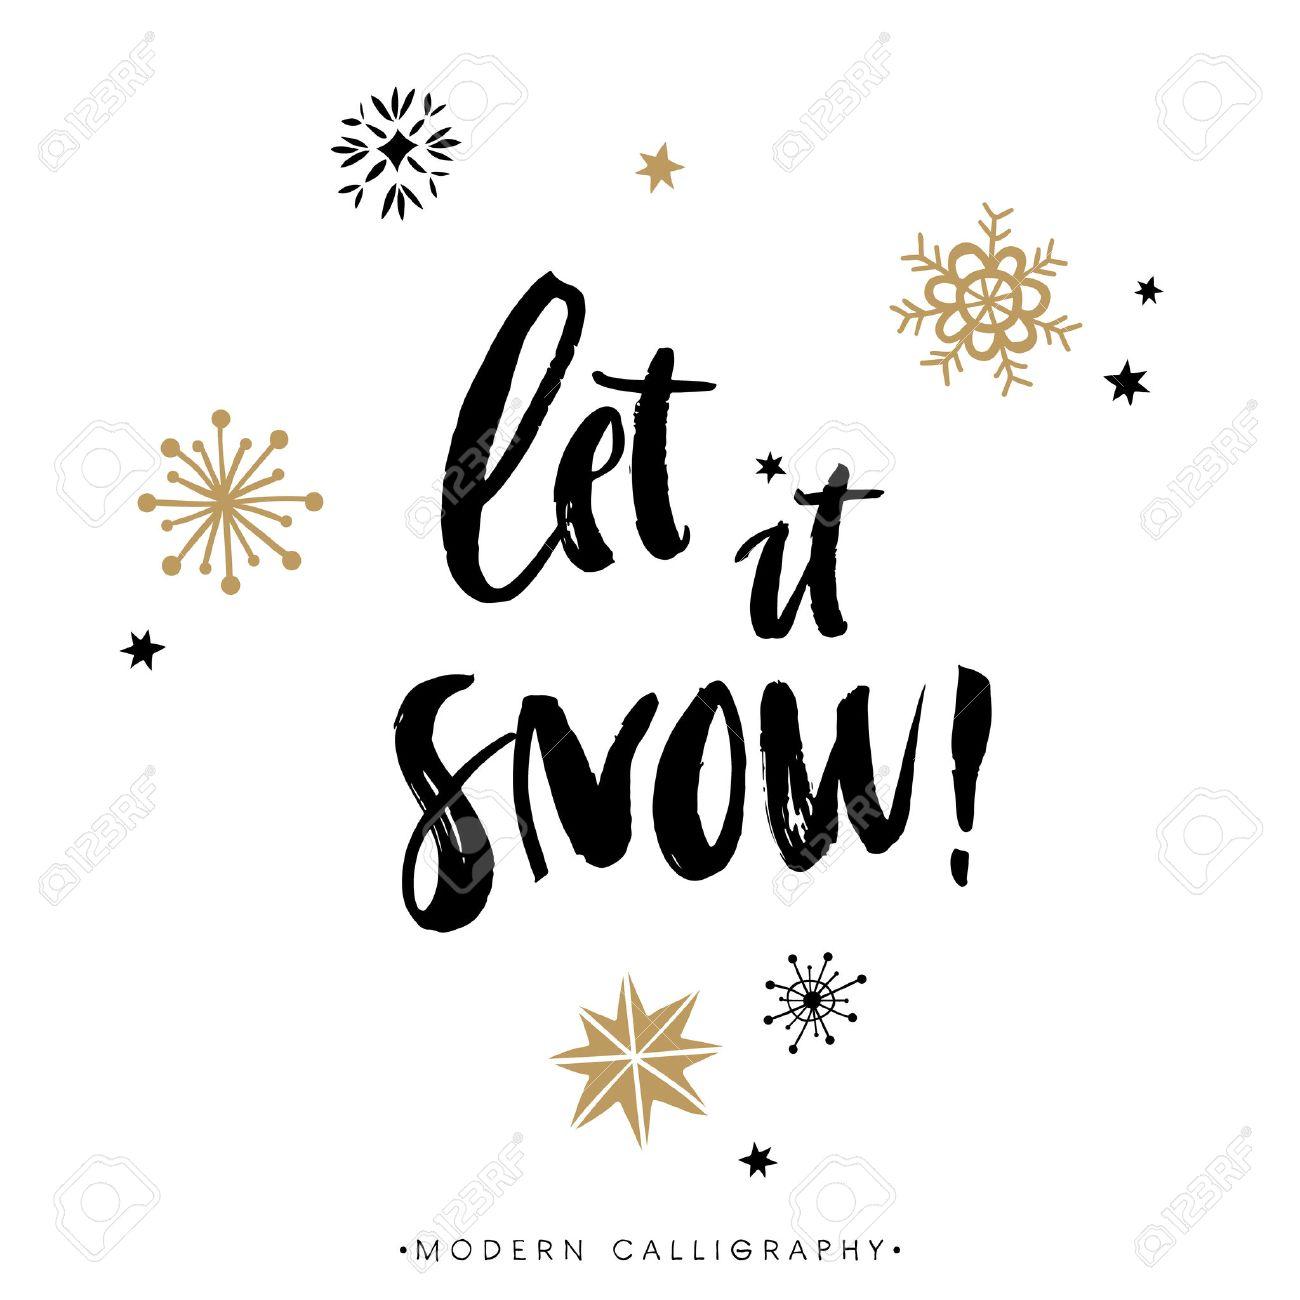 Let it snow! Christmas calligraphy. Handwritten modern brush lettering. Hand drawn design elements. - 48457224